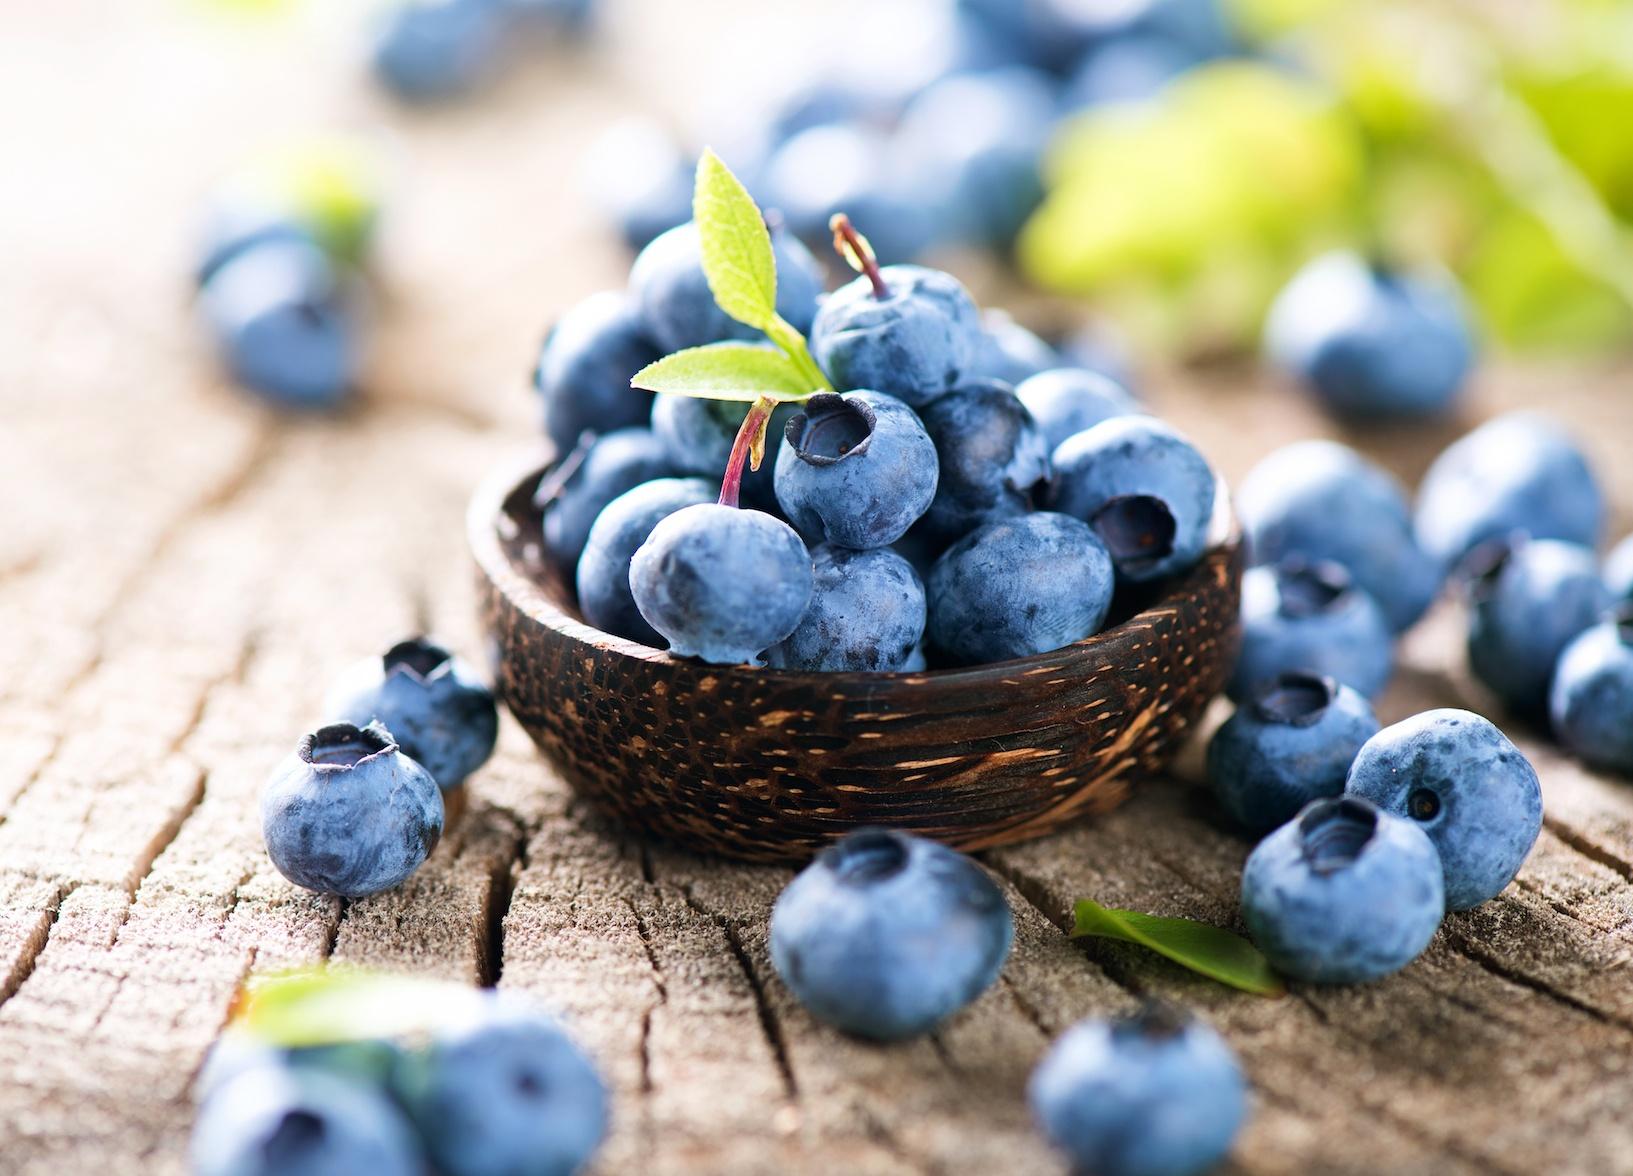 Blueberries turn out better when grown alongside grass • Earth.com